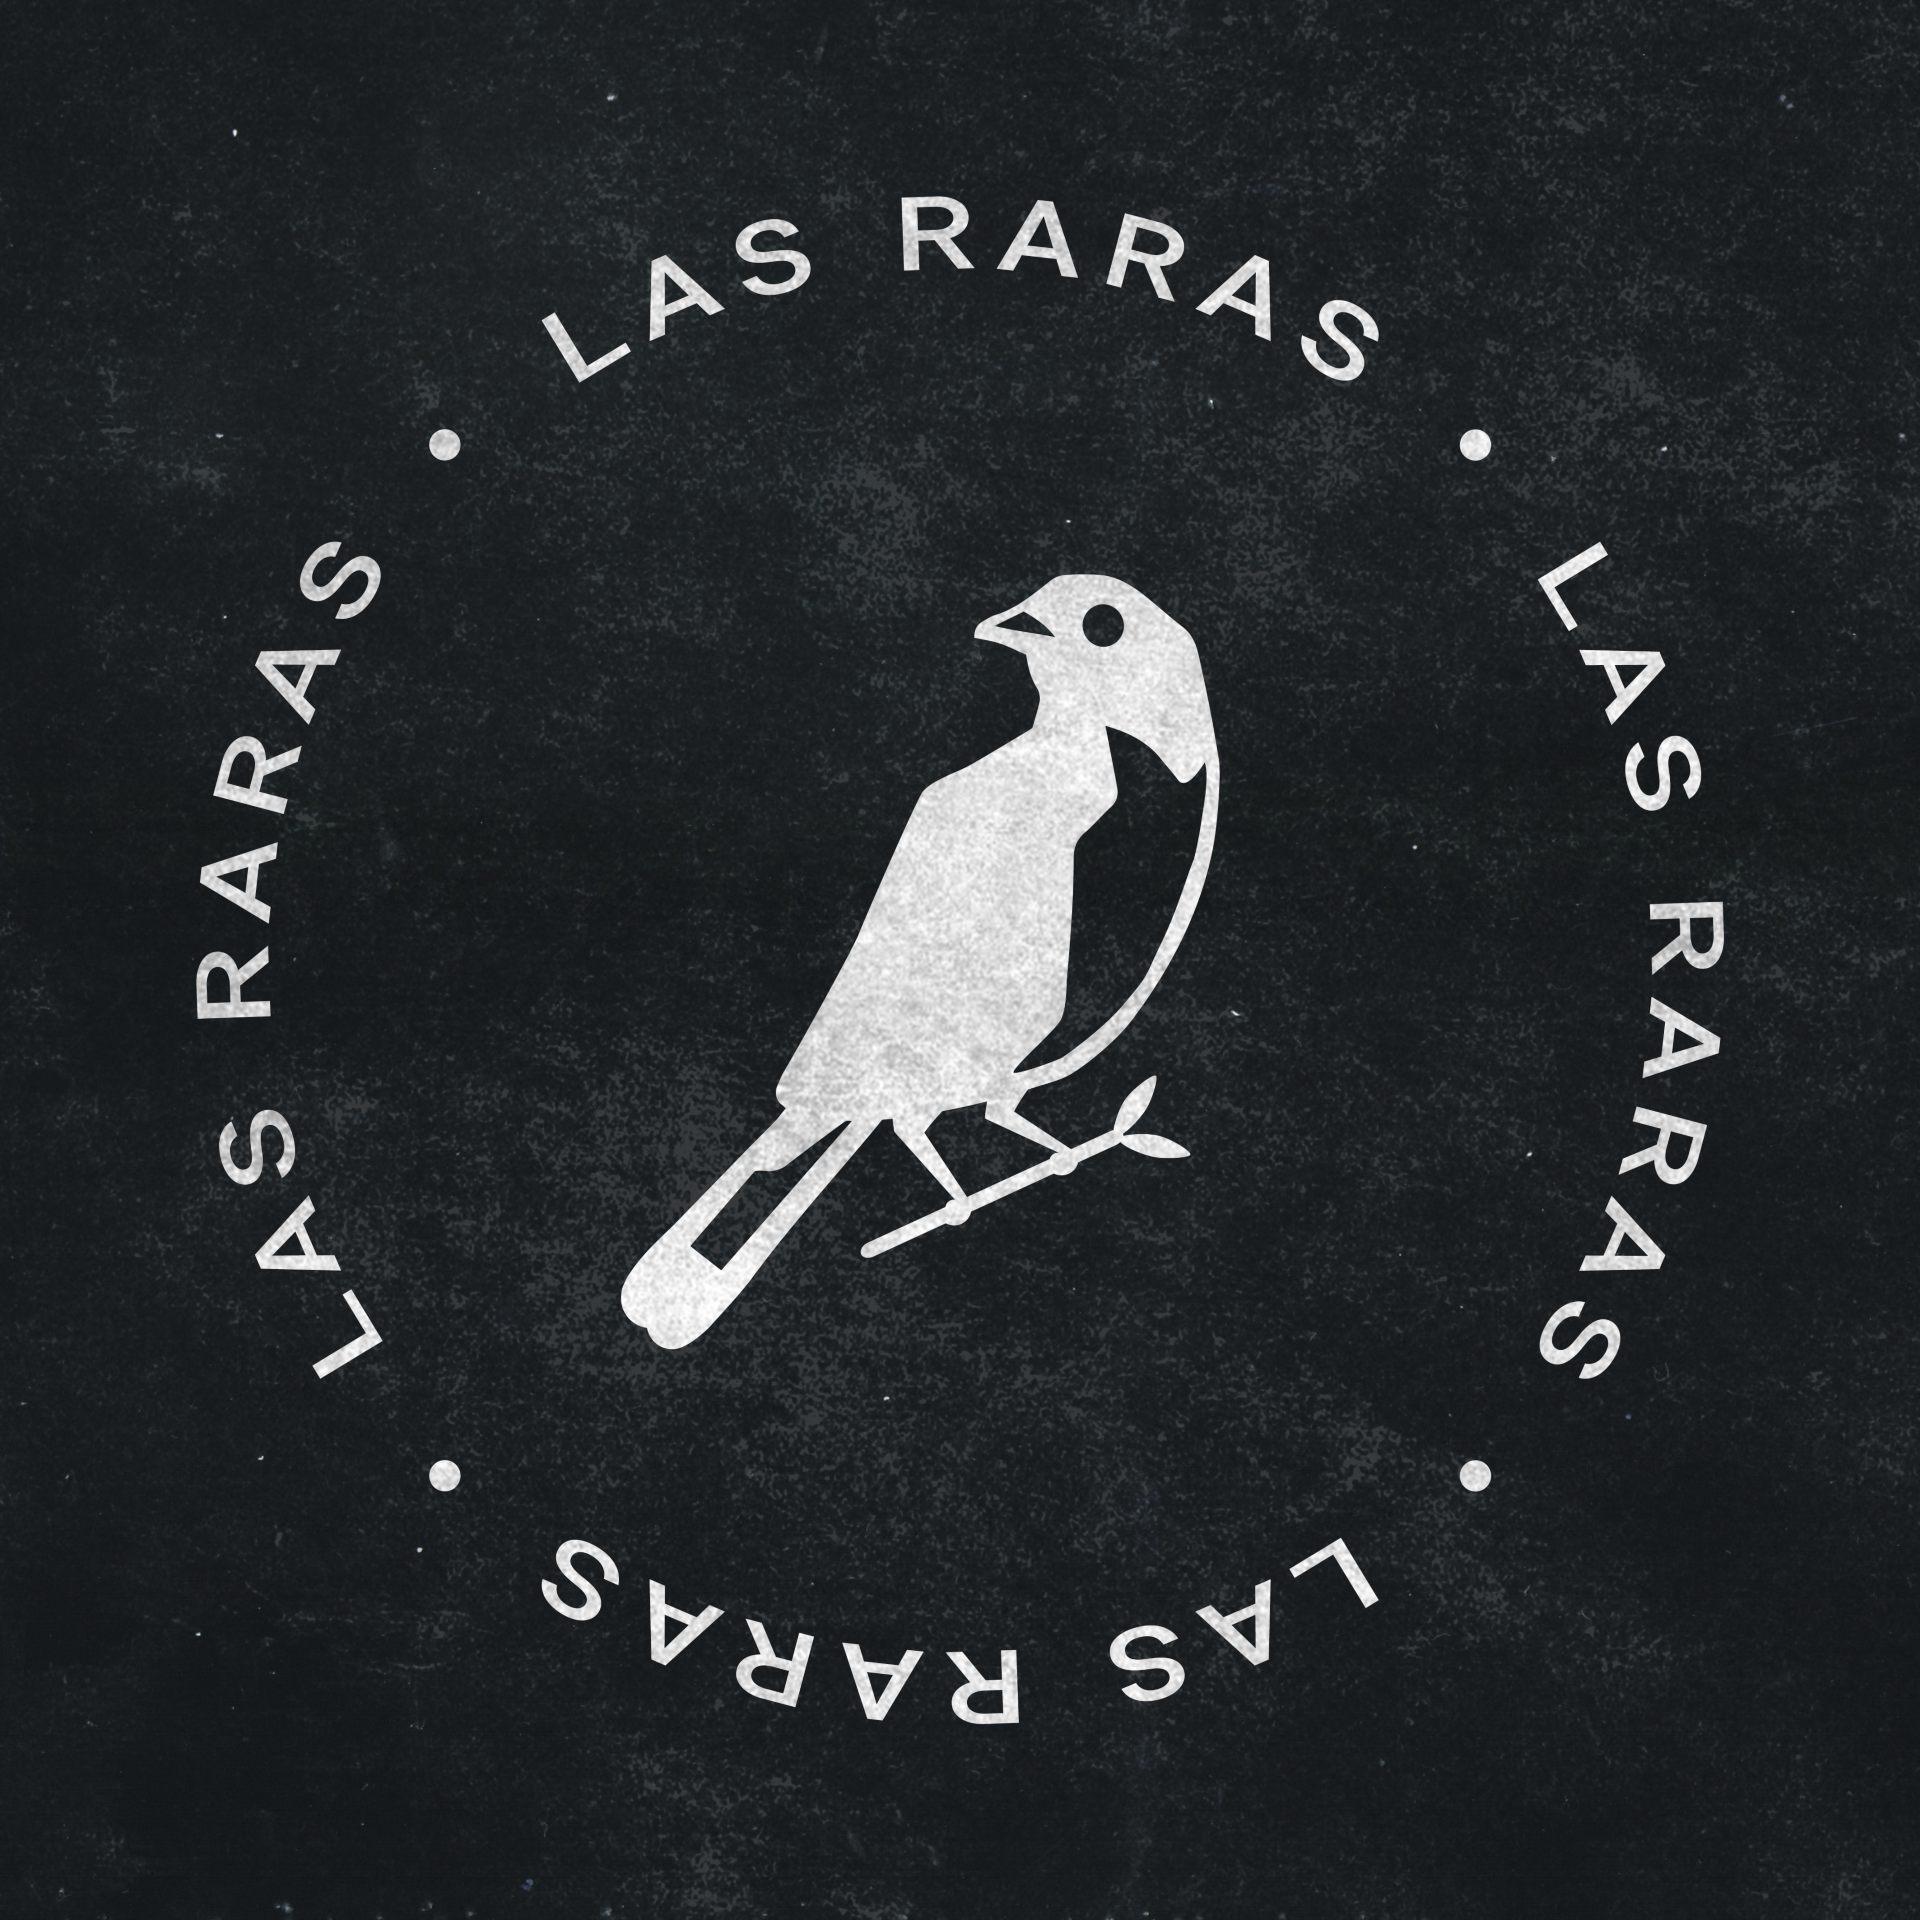 Gentileza: Las Raras Podcast